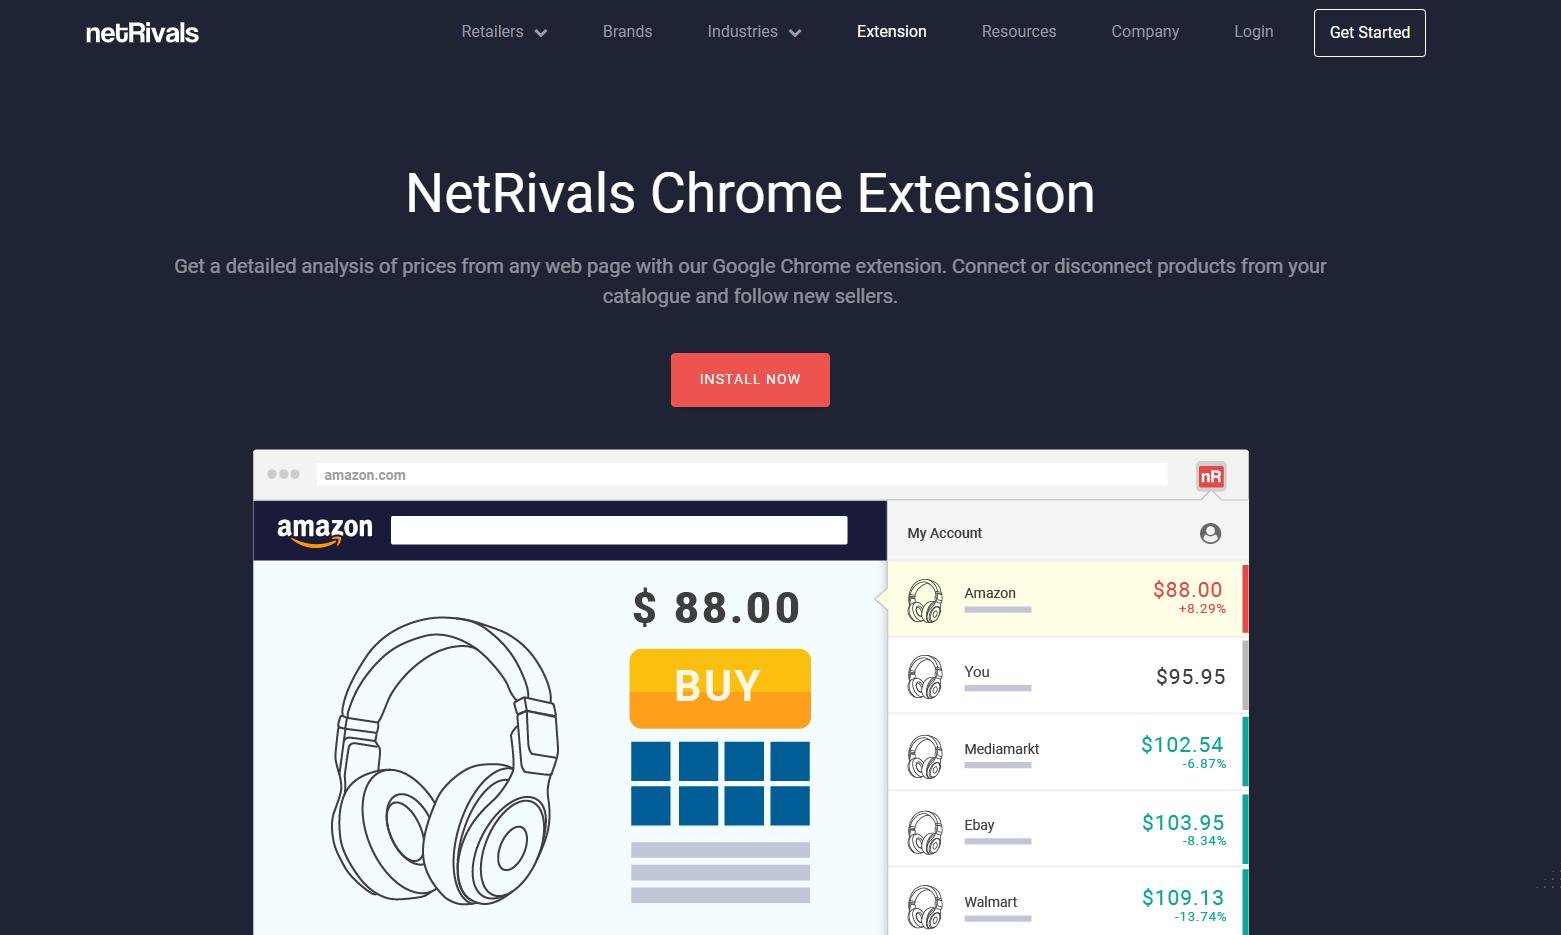 netrivals chrome extension